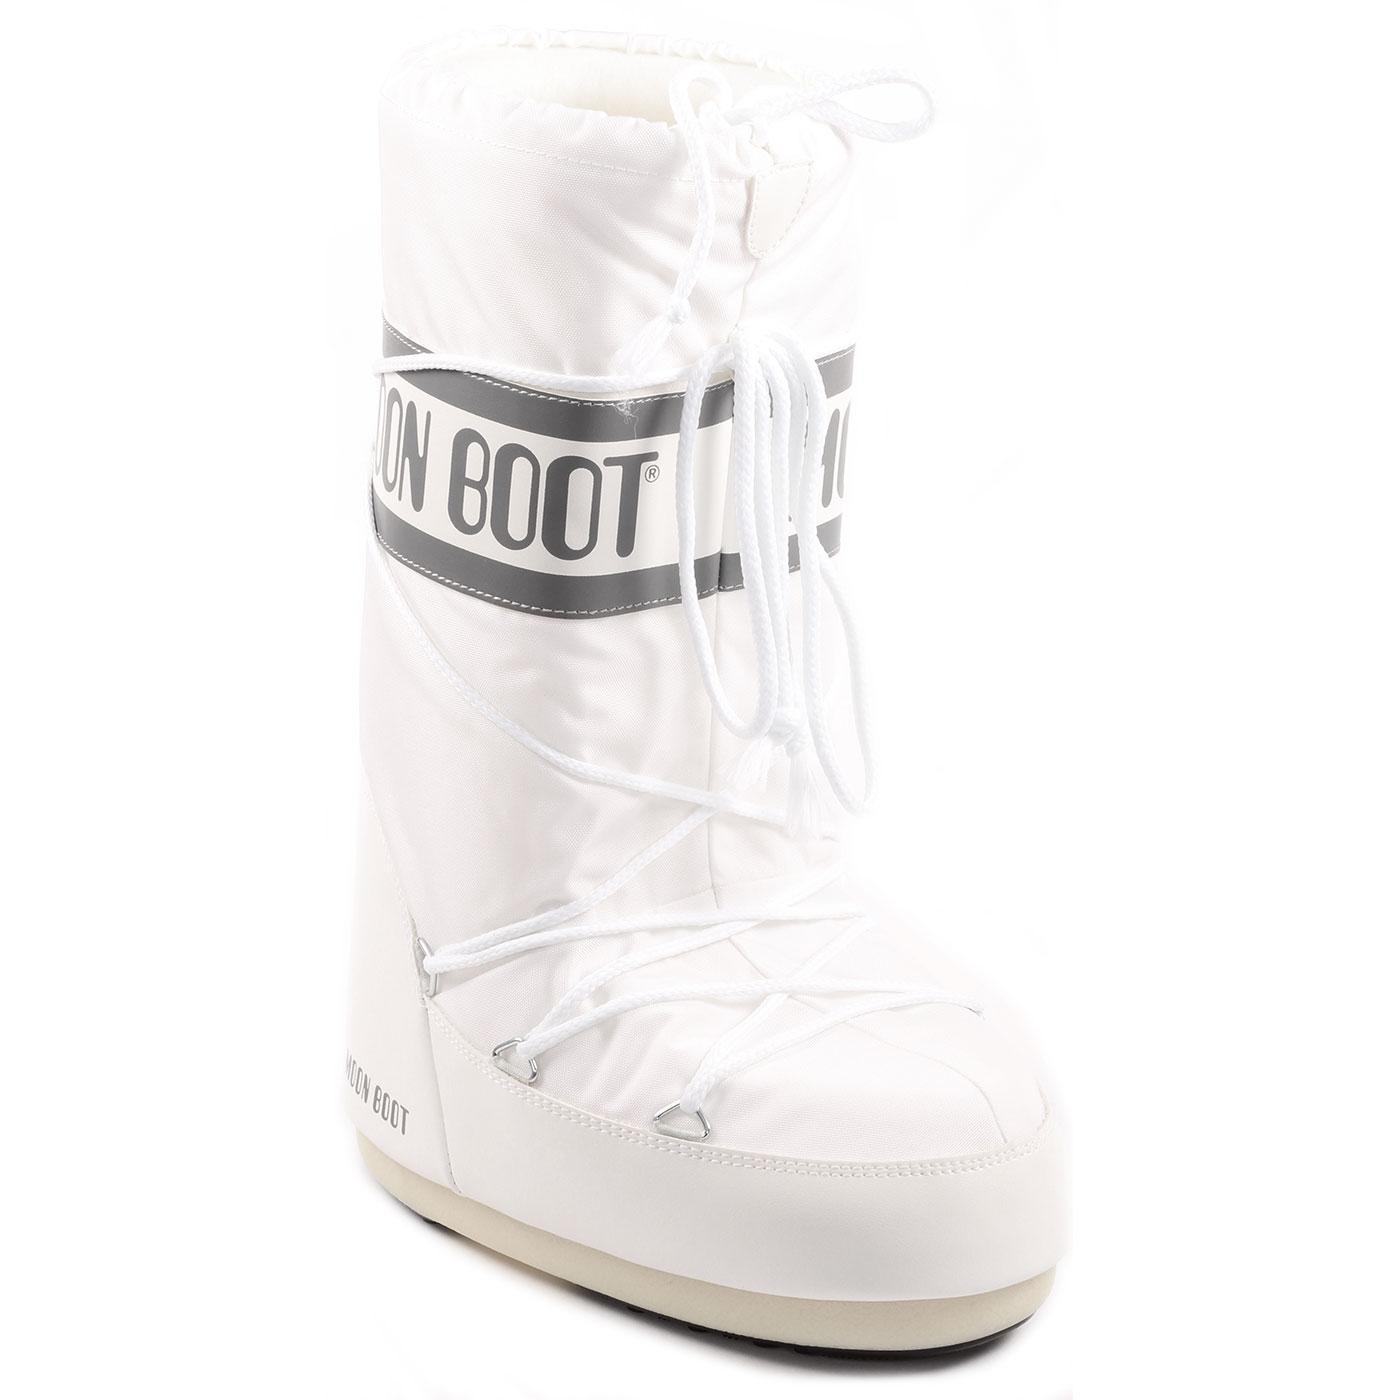 ORIGINAL MOON BOOT Classic Retro 70s Snow Boots W